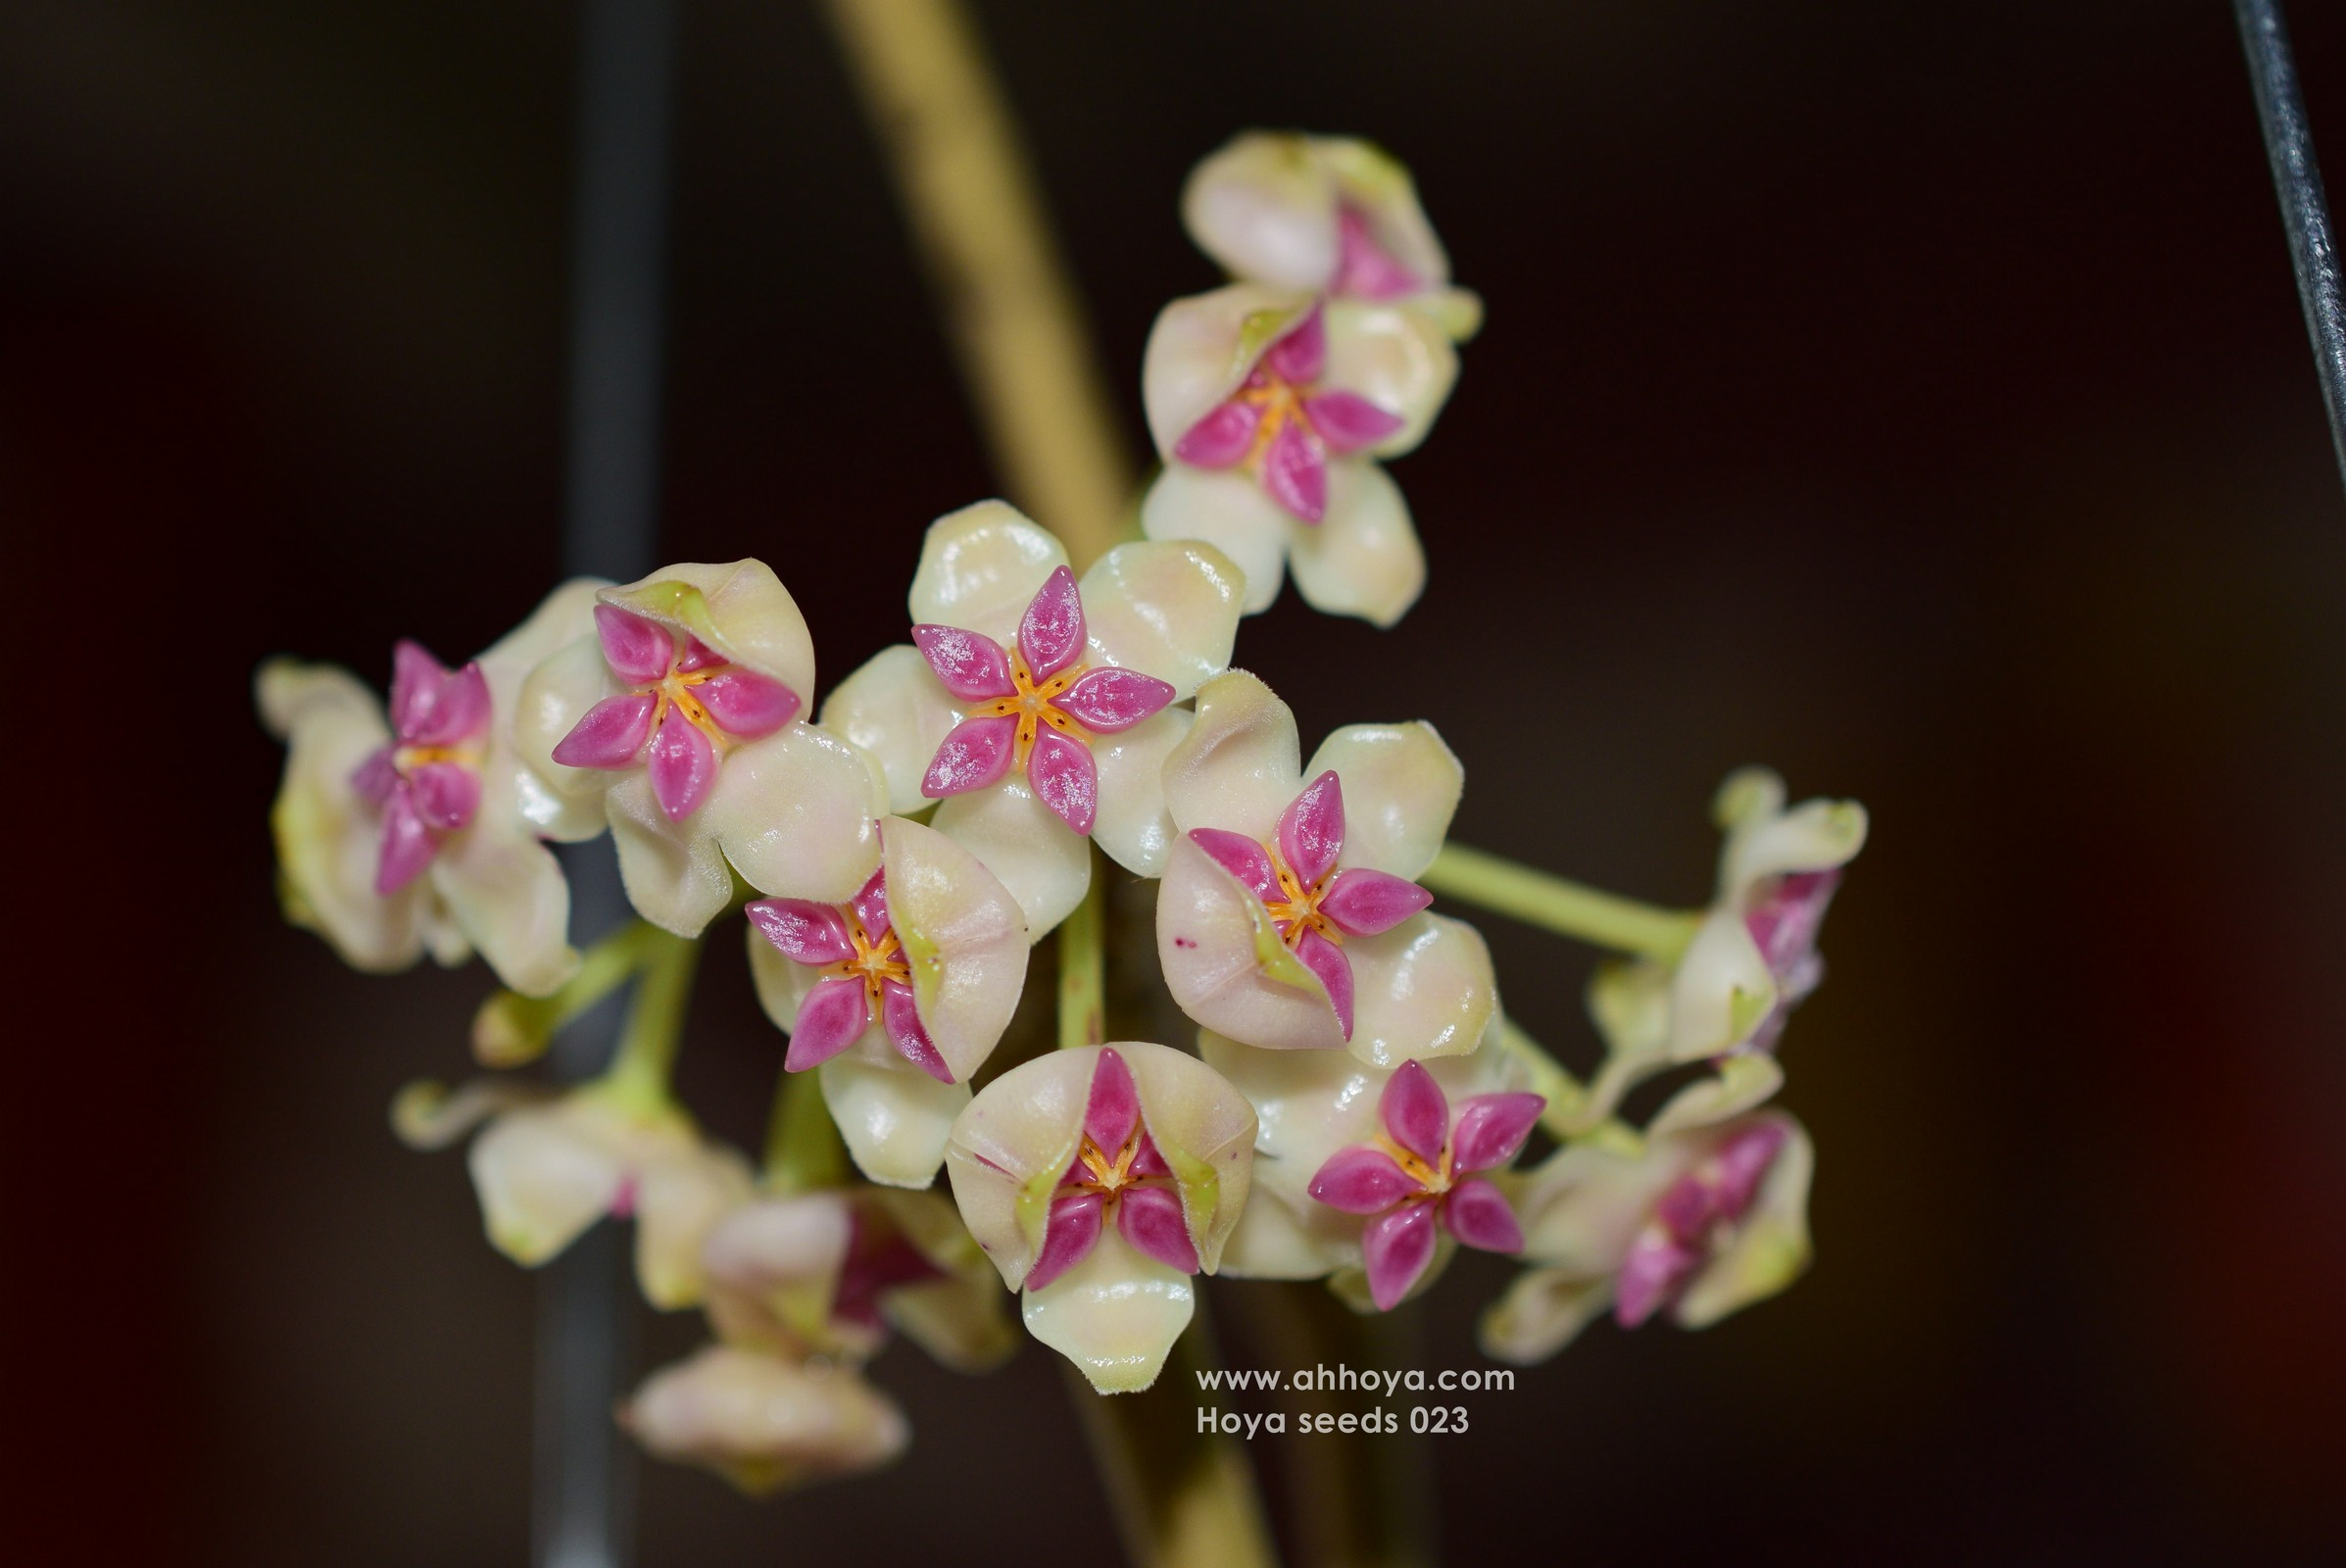 Hoya Plants Nursery Ah Cutting สวนหล งบ าน ขายโฮย า ไม น ว ร ช อดอก จ ดส งท วประเทศ สวน เล อย ประด บ